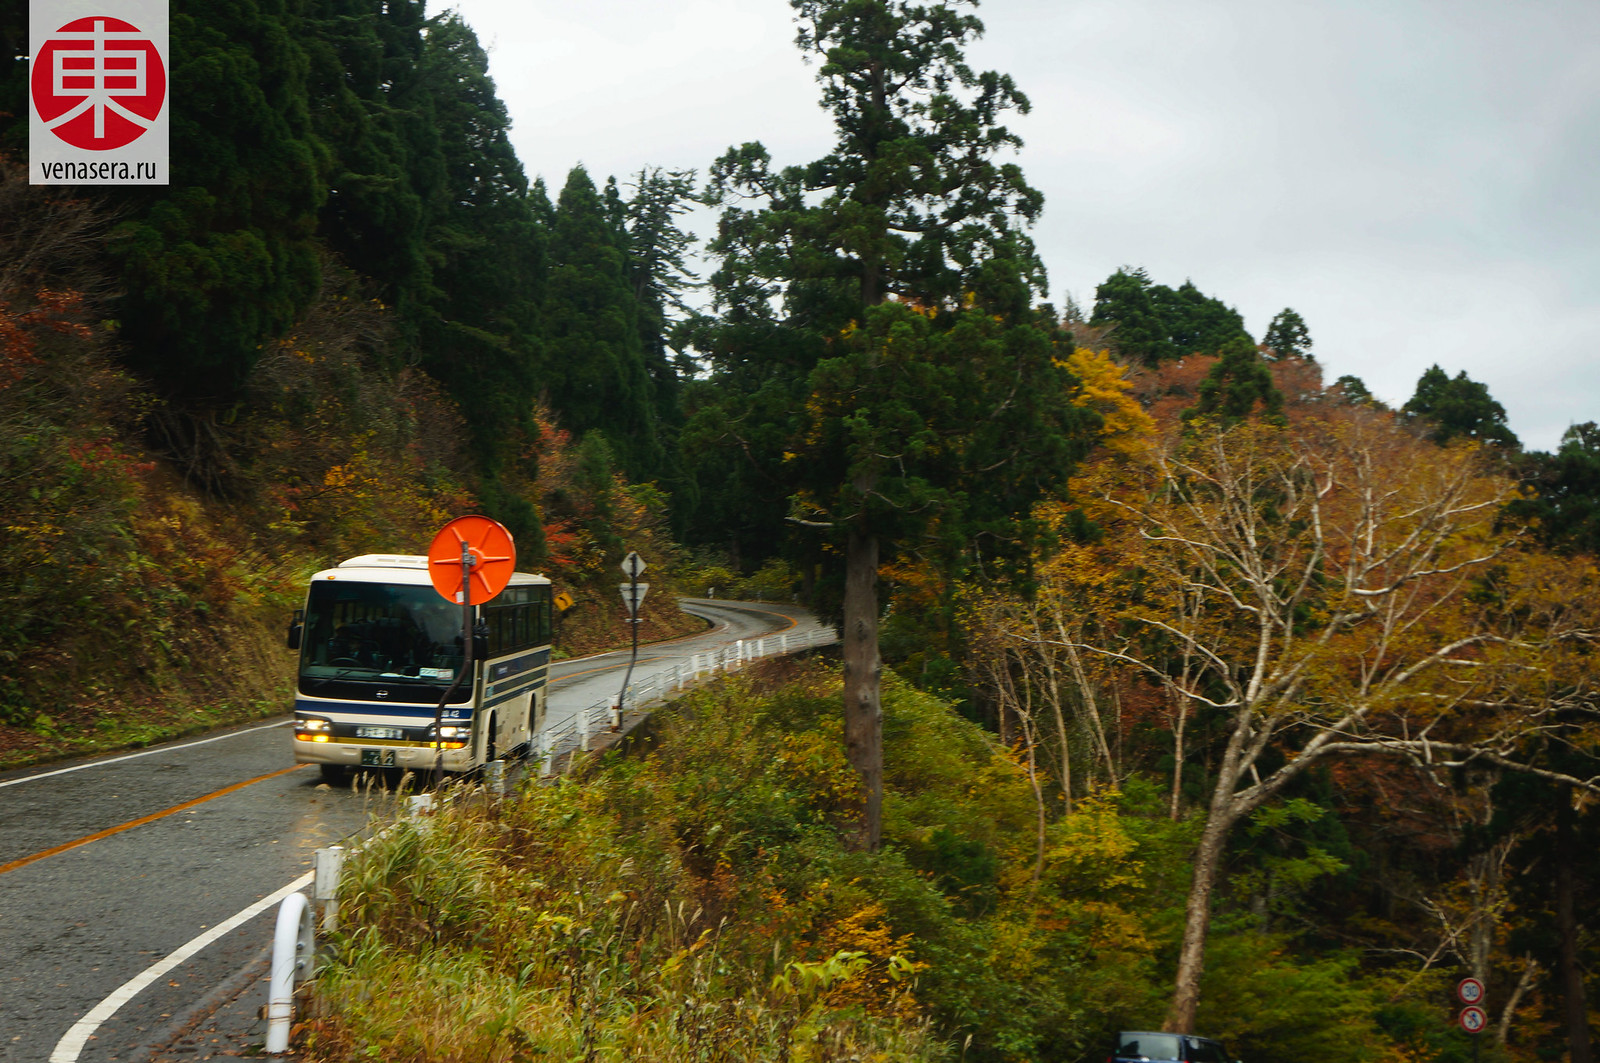 Японские Альпы Татэяма Куробэ, Татэяма Куробэ, Tateyama Kurobe Alpine Route, 立山黒部, 立山黒部アルペンルート